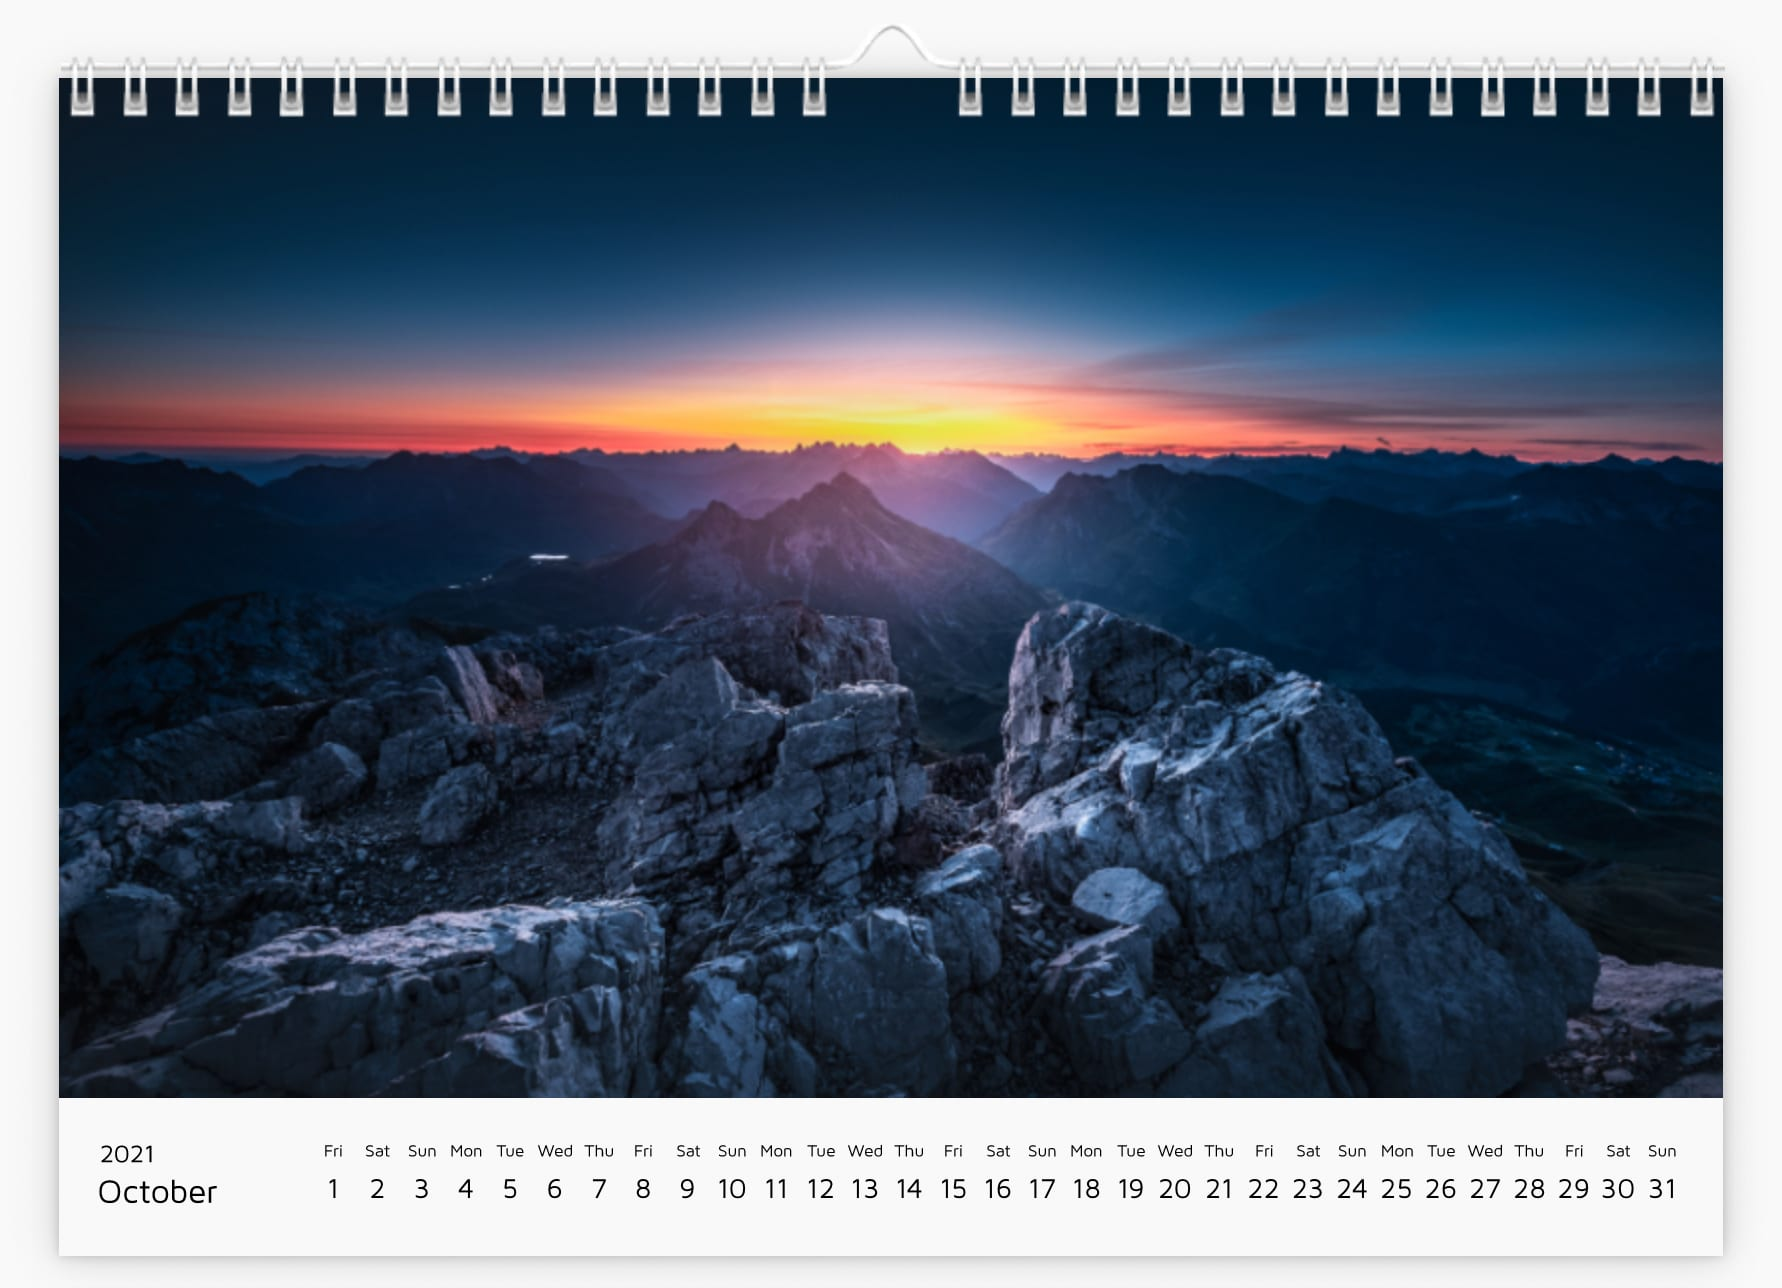 October - Calendar 2021